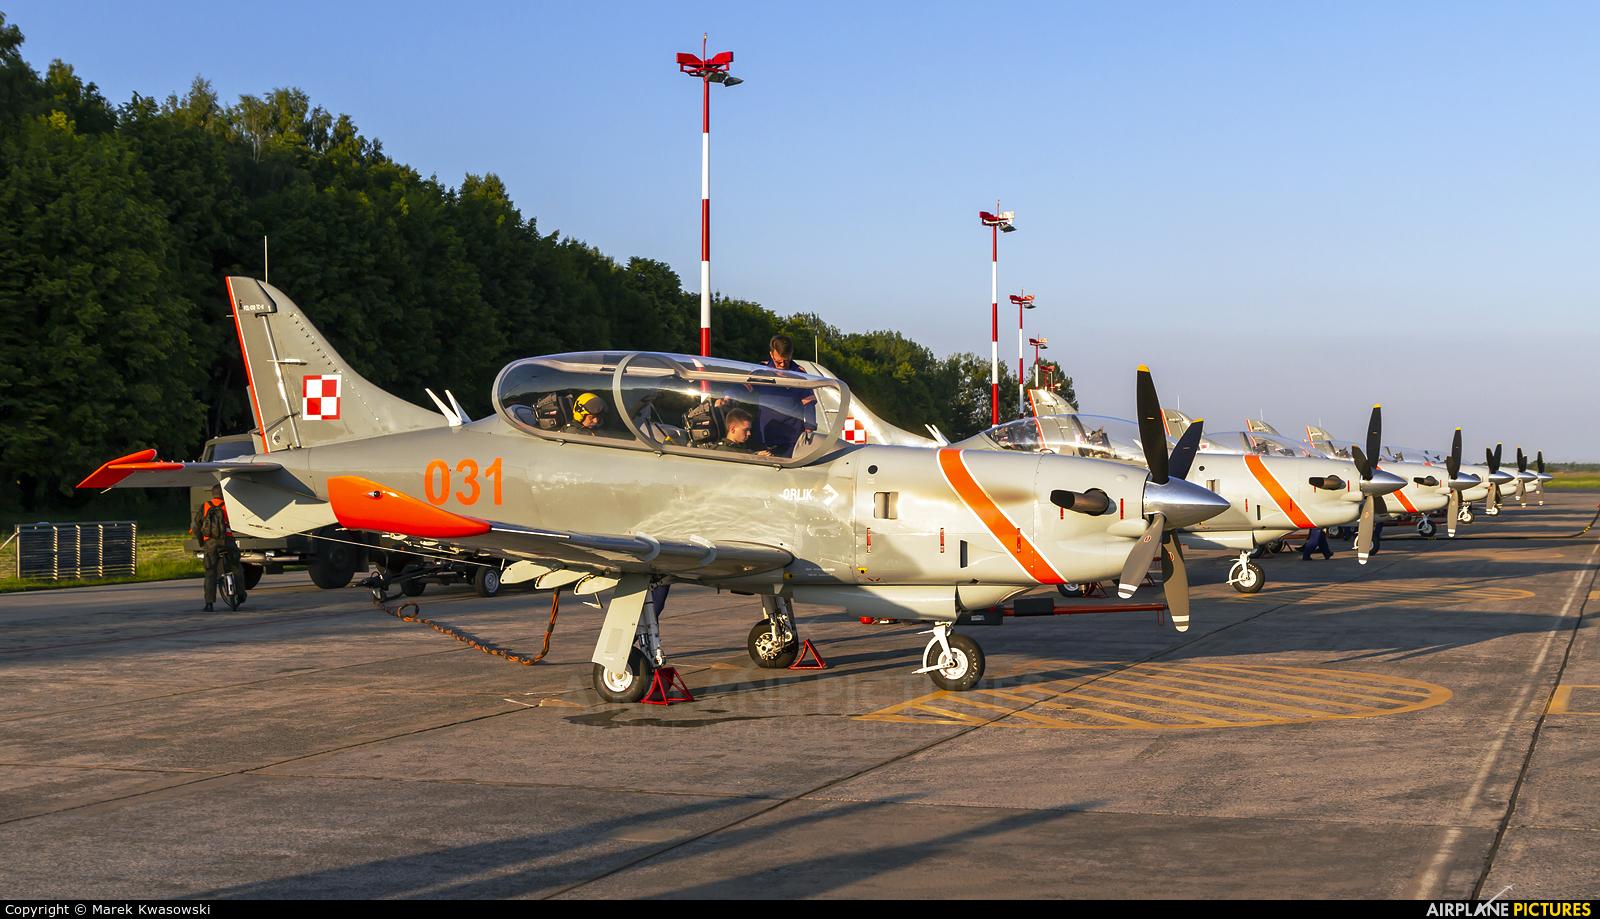 "Poland - Air Force ""Orlik Acrobatic Group"" 031 aircraft at Radom - Sadków"